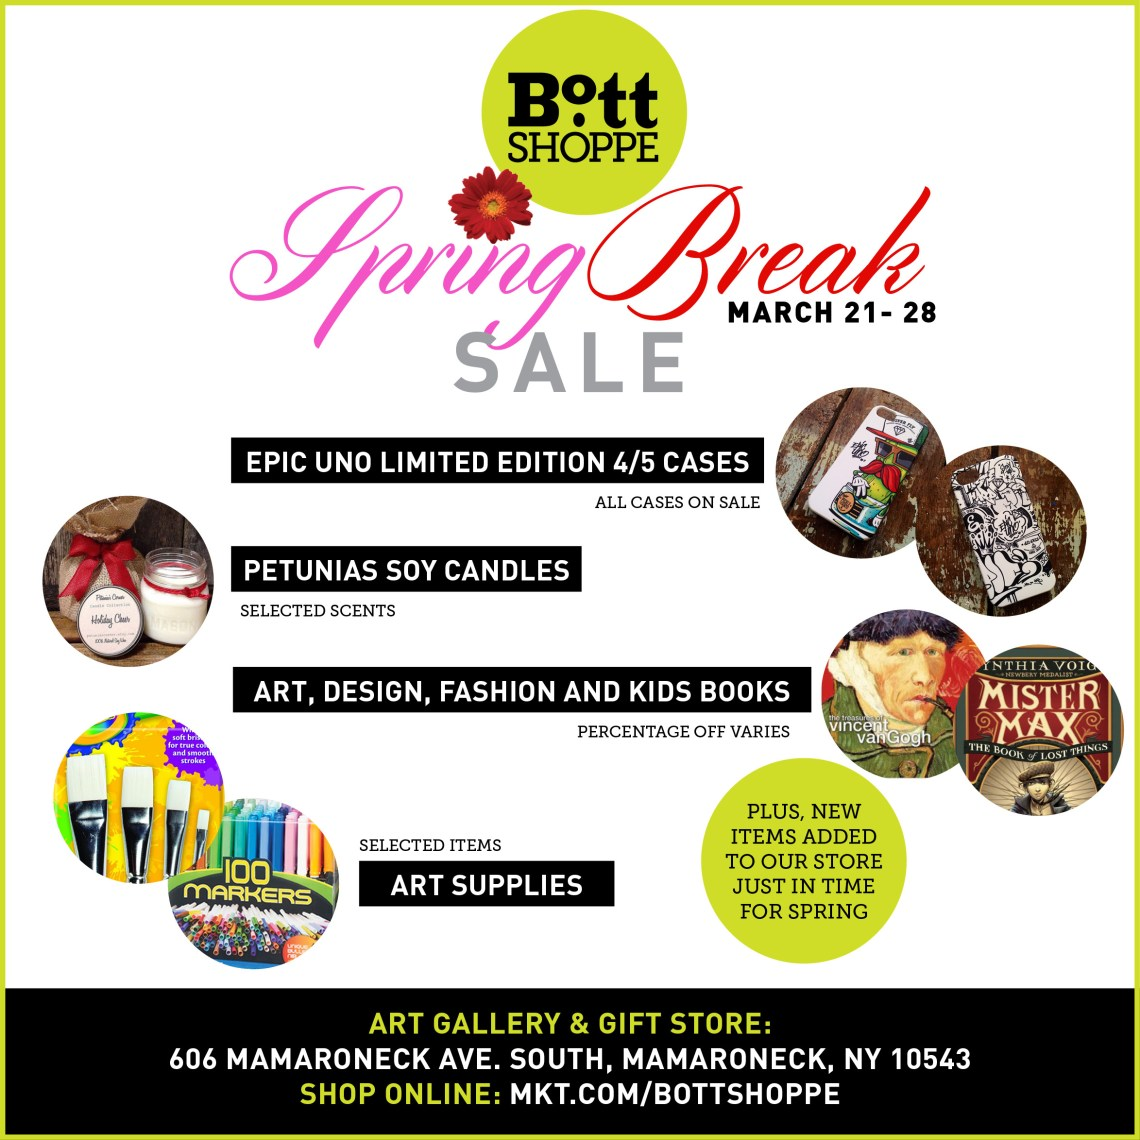 TBS_IG_SALE_SpringBreak_items